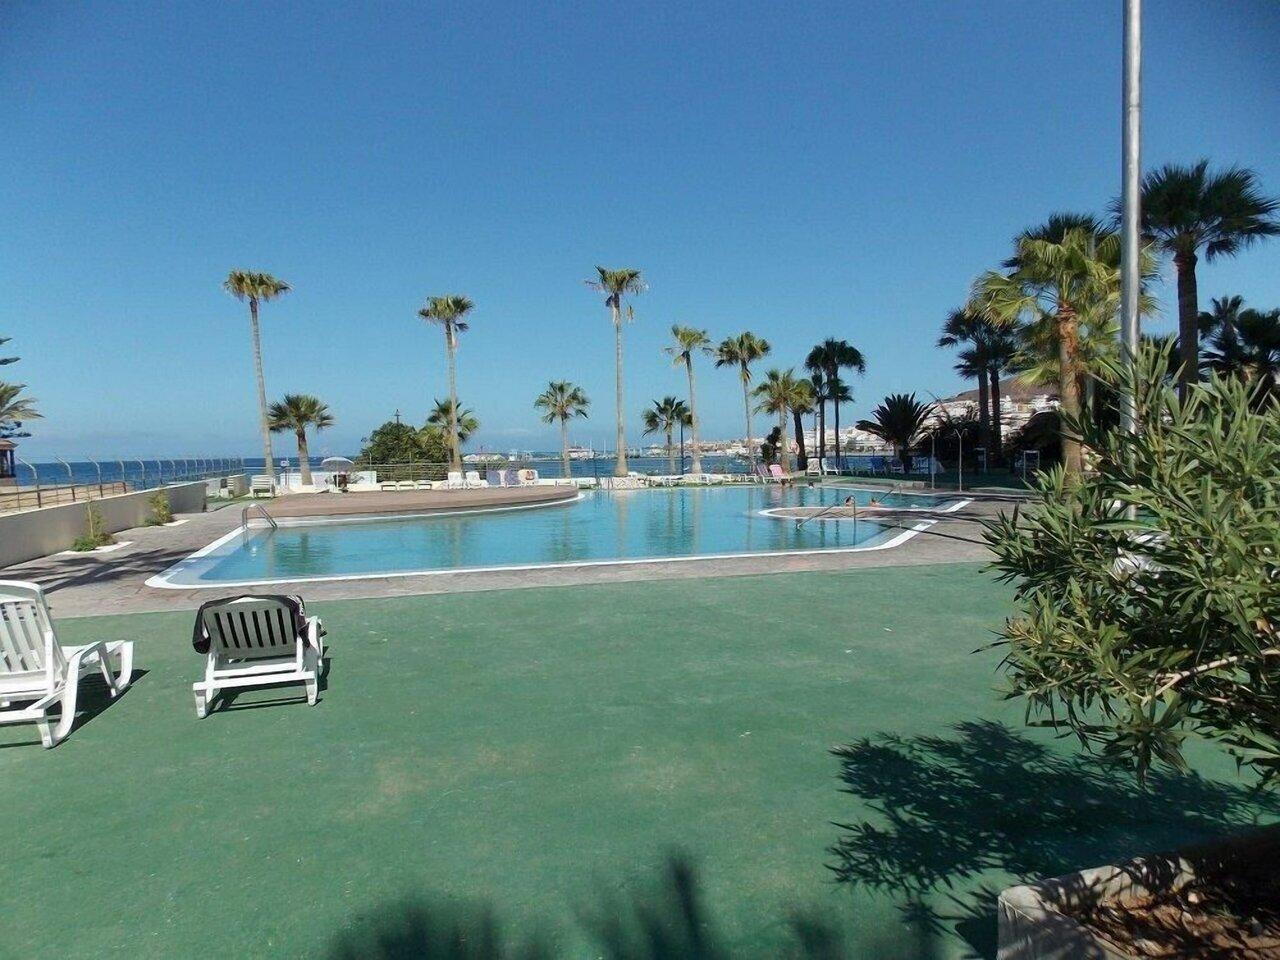 Costa Mar Apts.